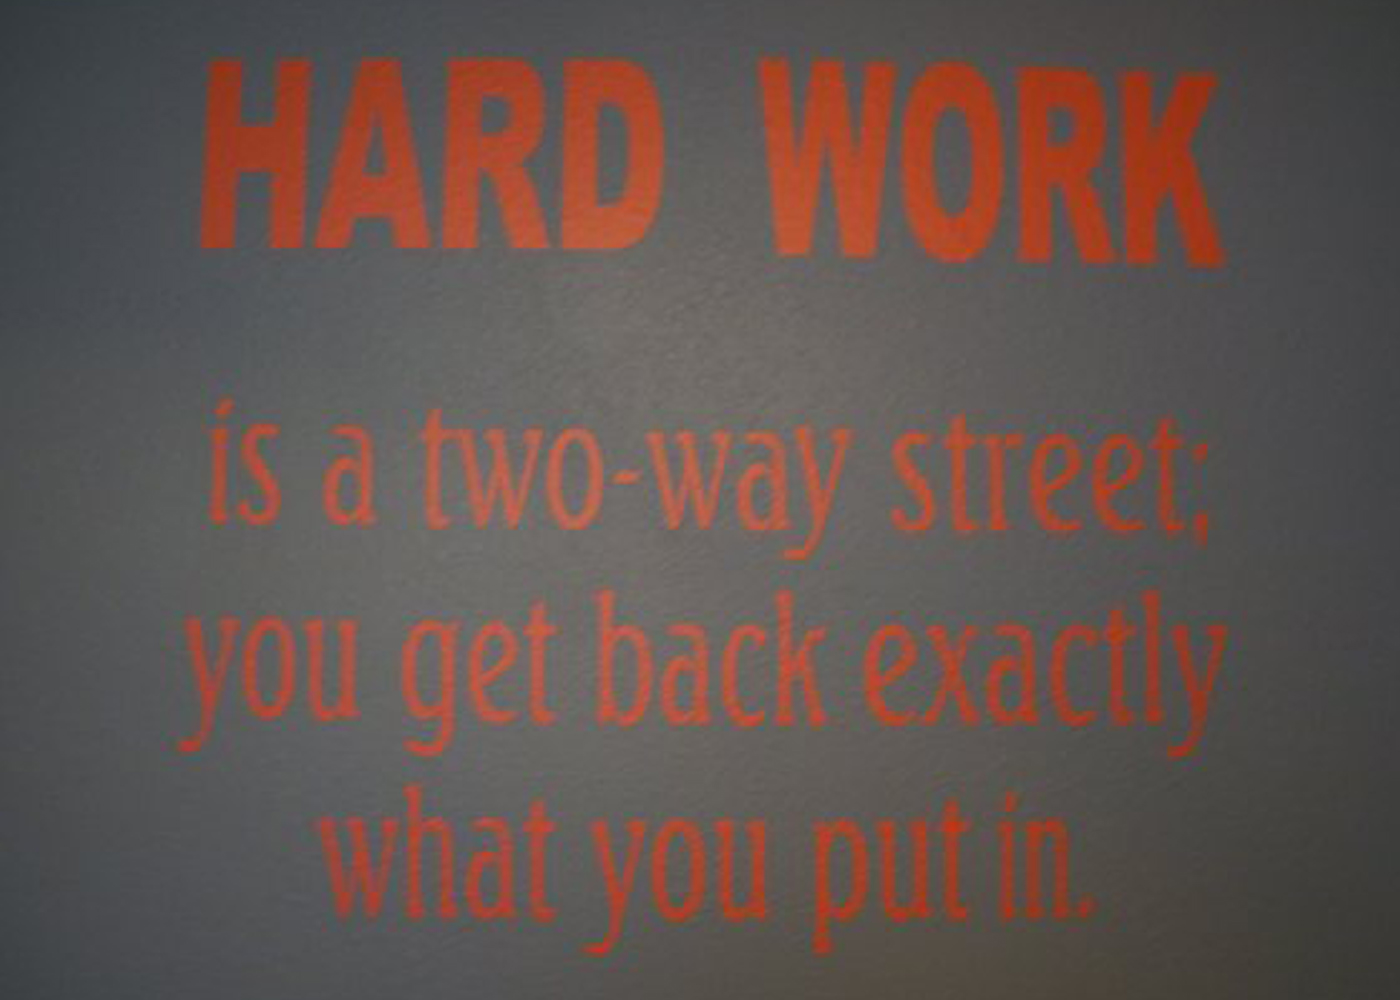 hard-work-vinyl-wall-decal-motivational-quote-renee.jpg